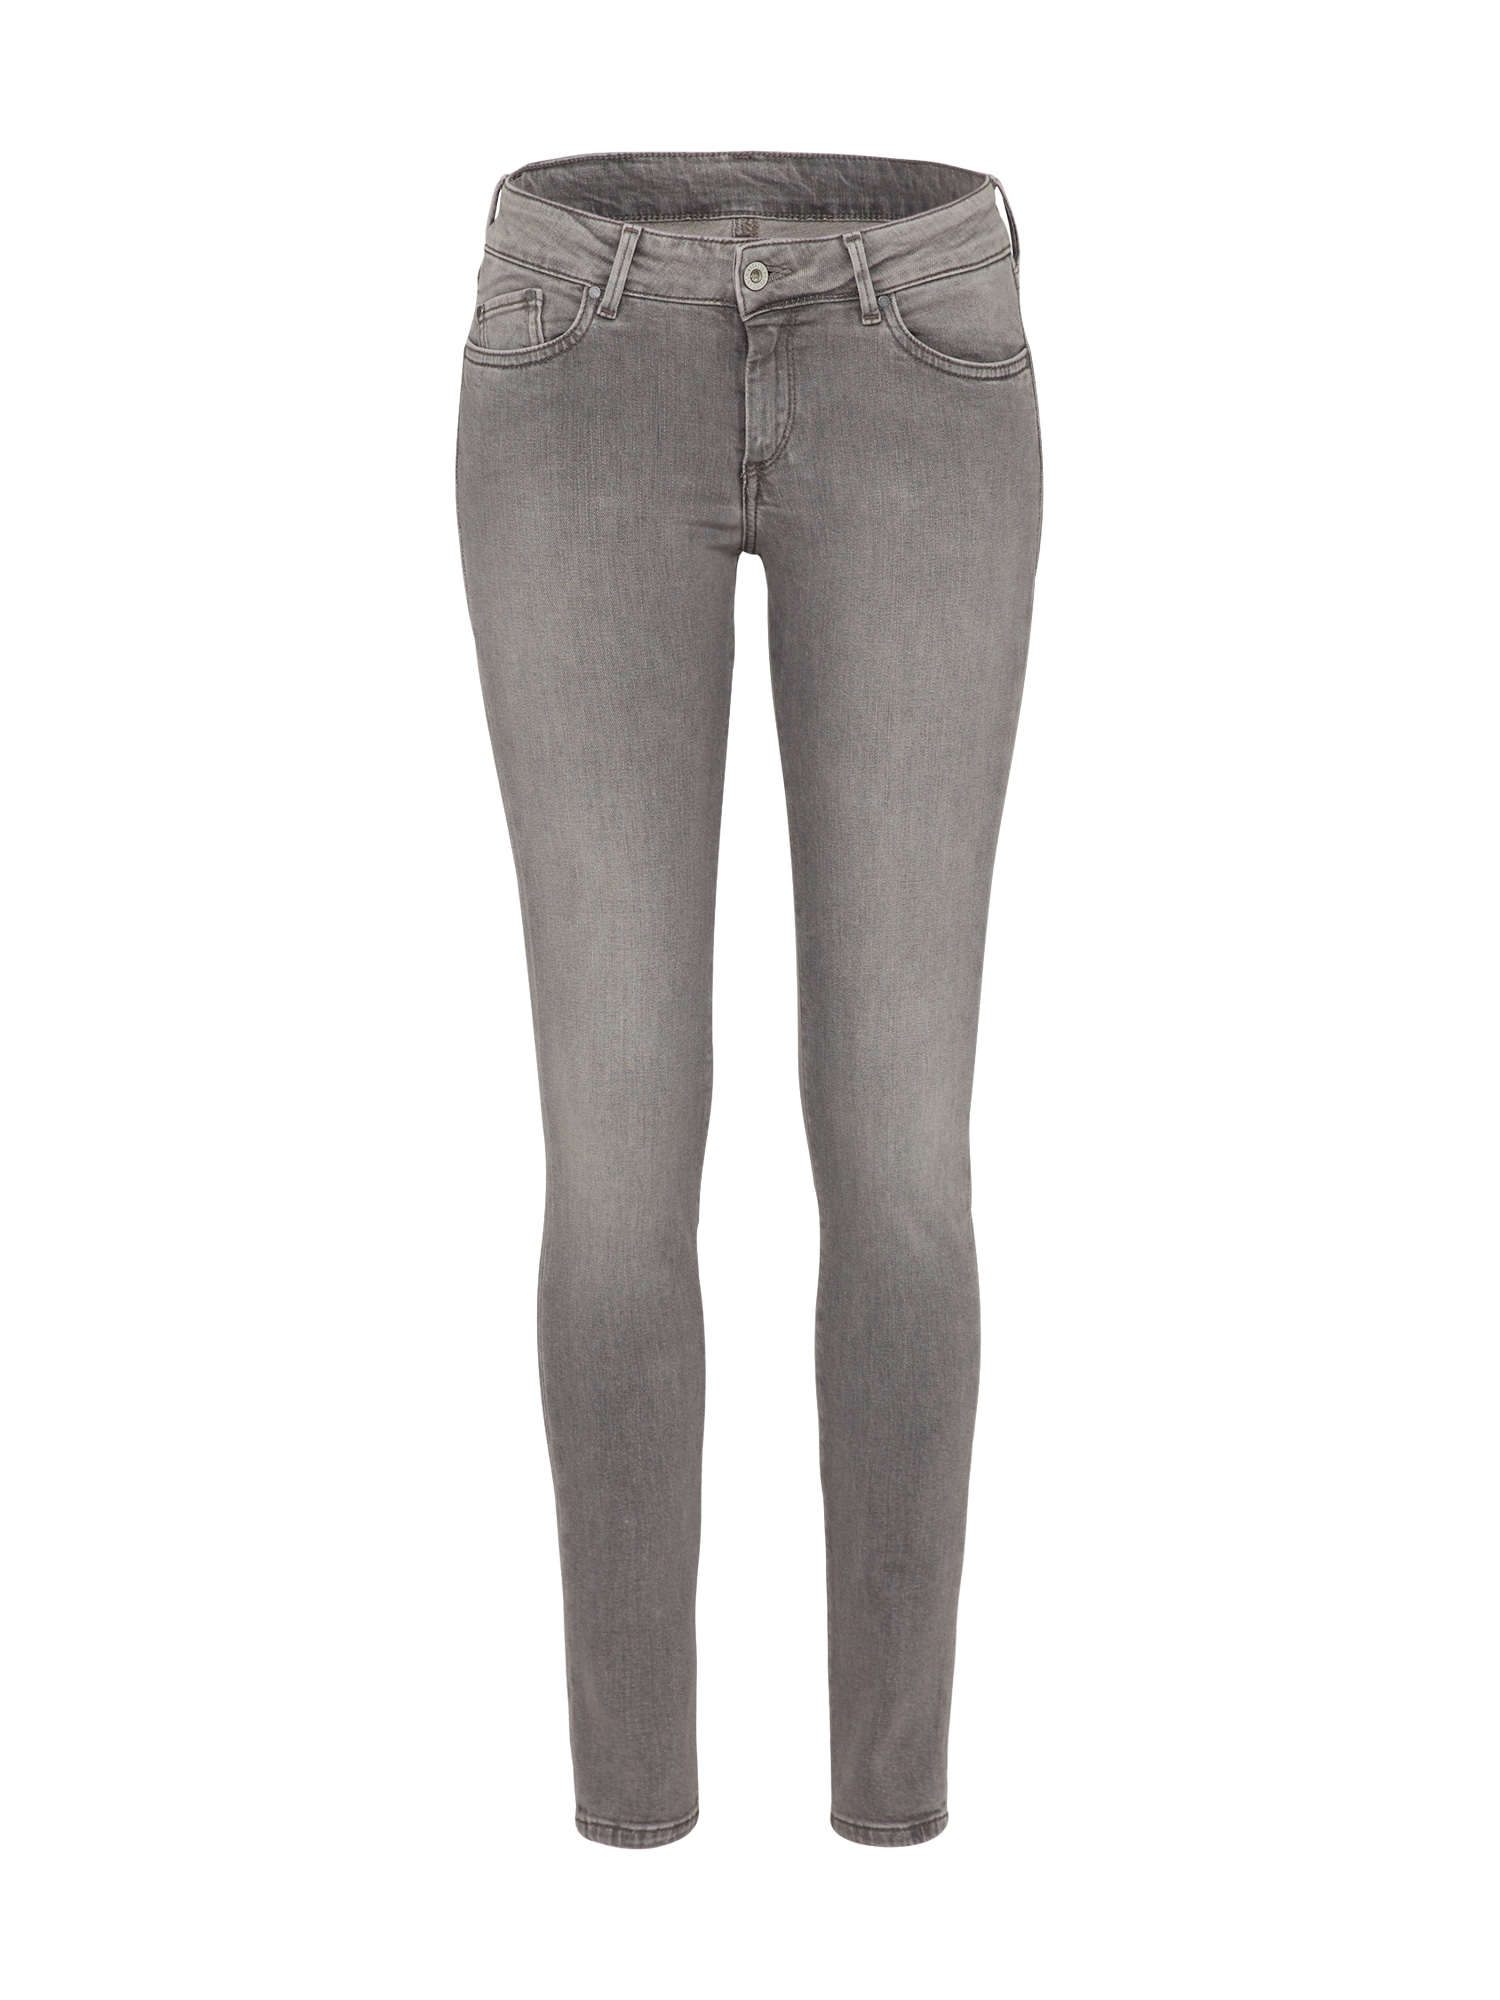 Pepe Jeans Dames Jeans Pixie grey denim